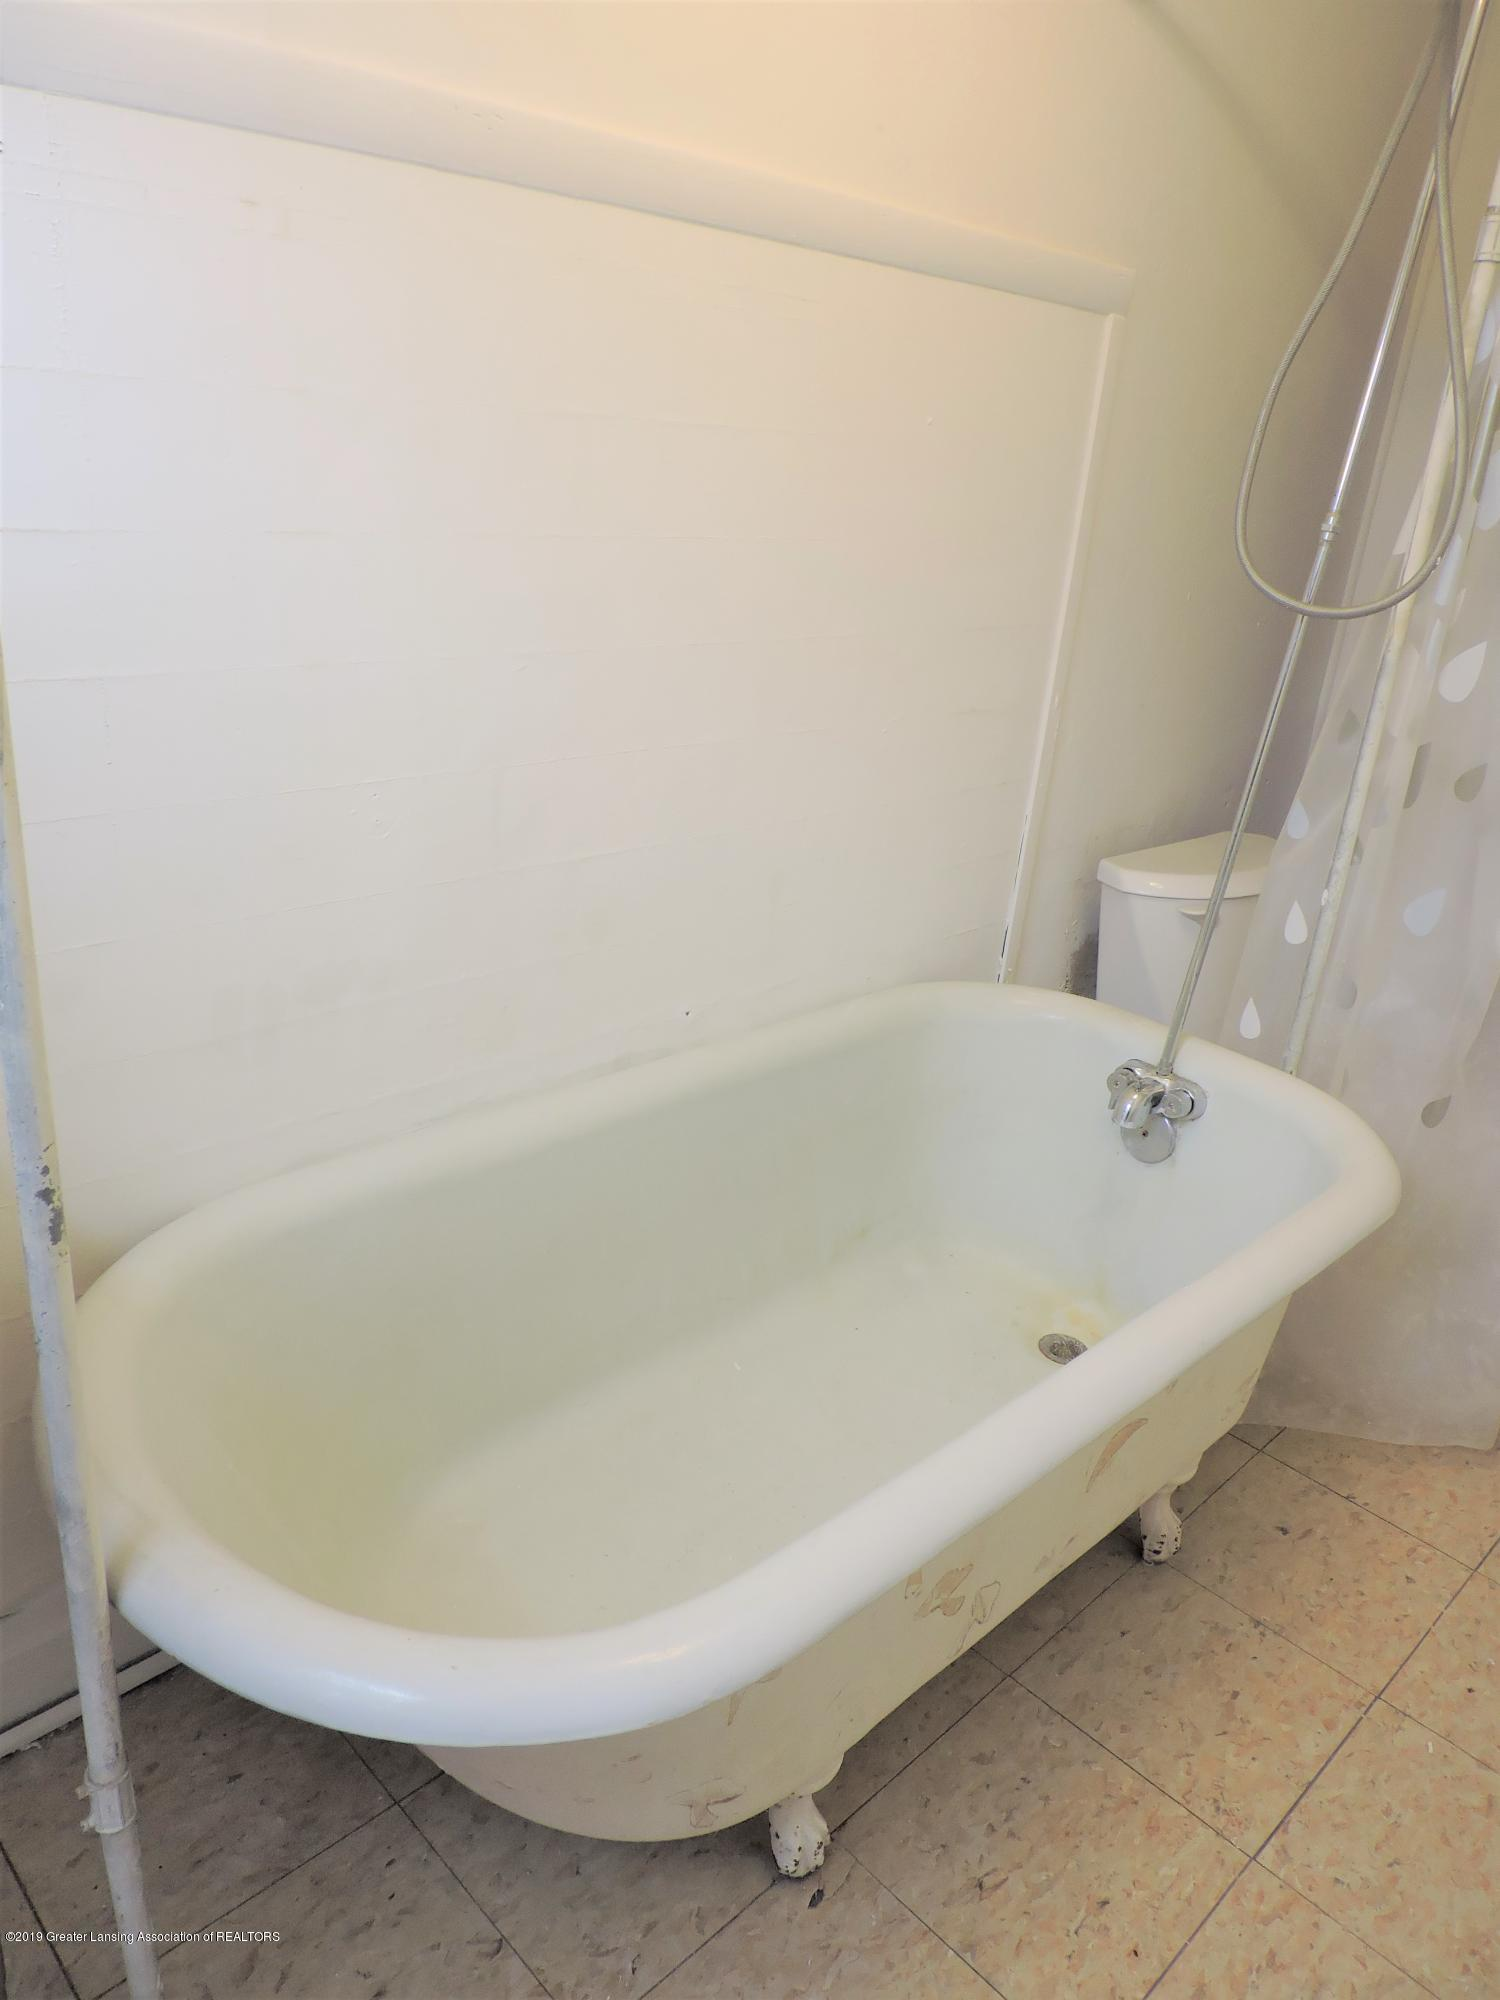 215 N Foster Ave - Bathroom 3 - 13